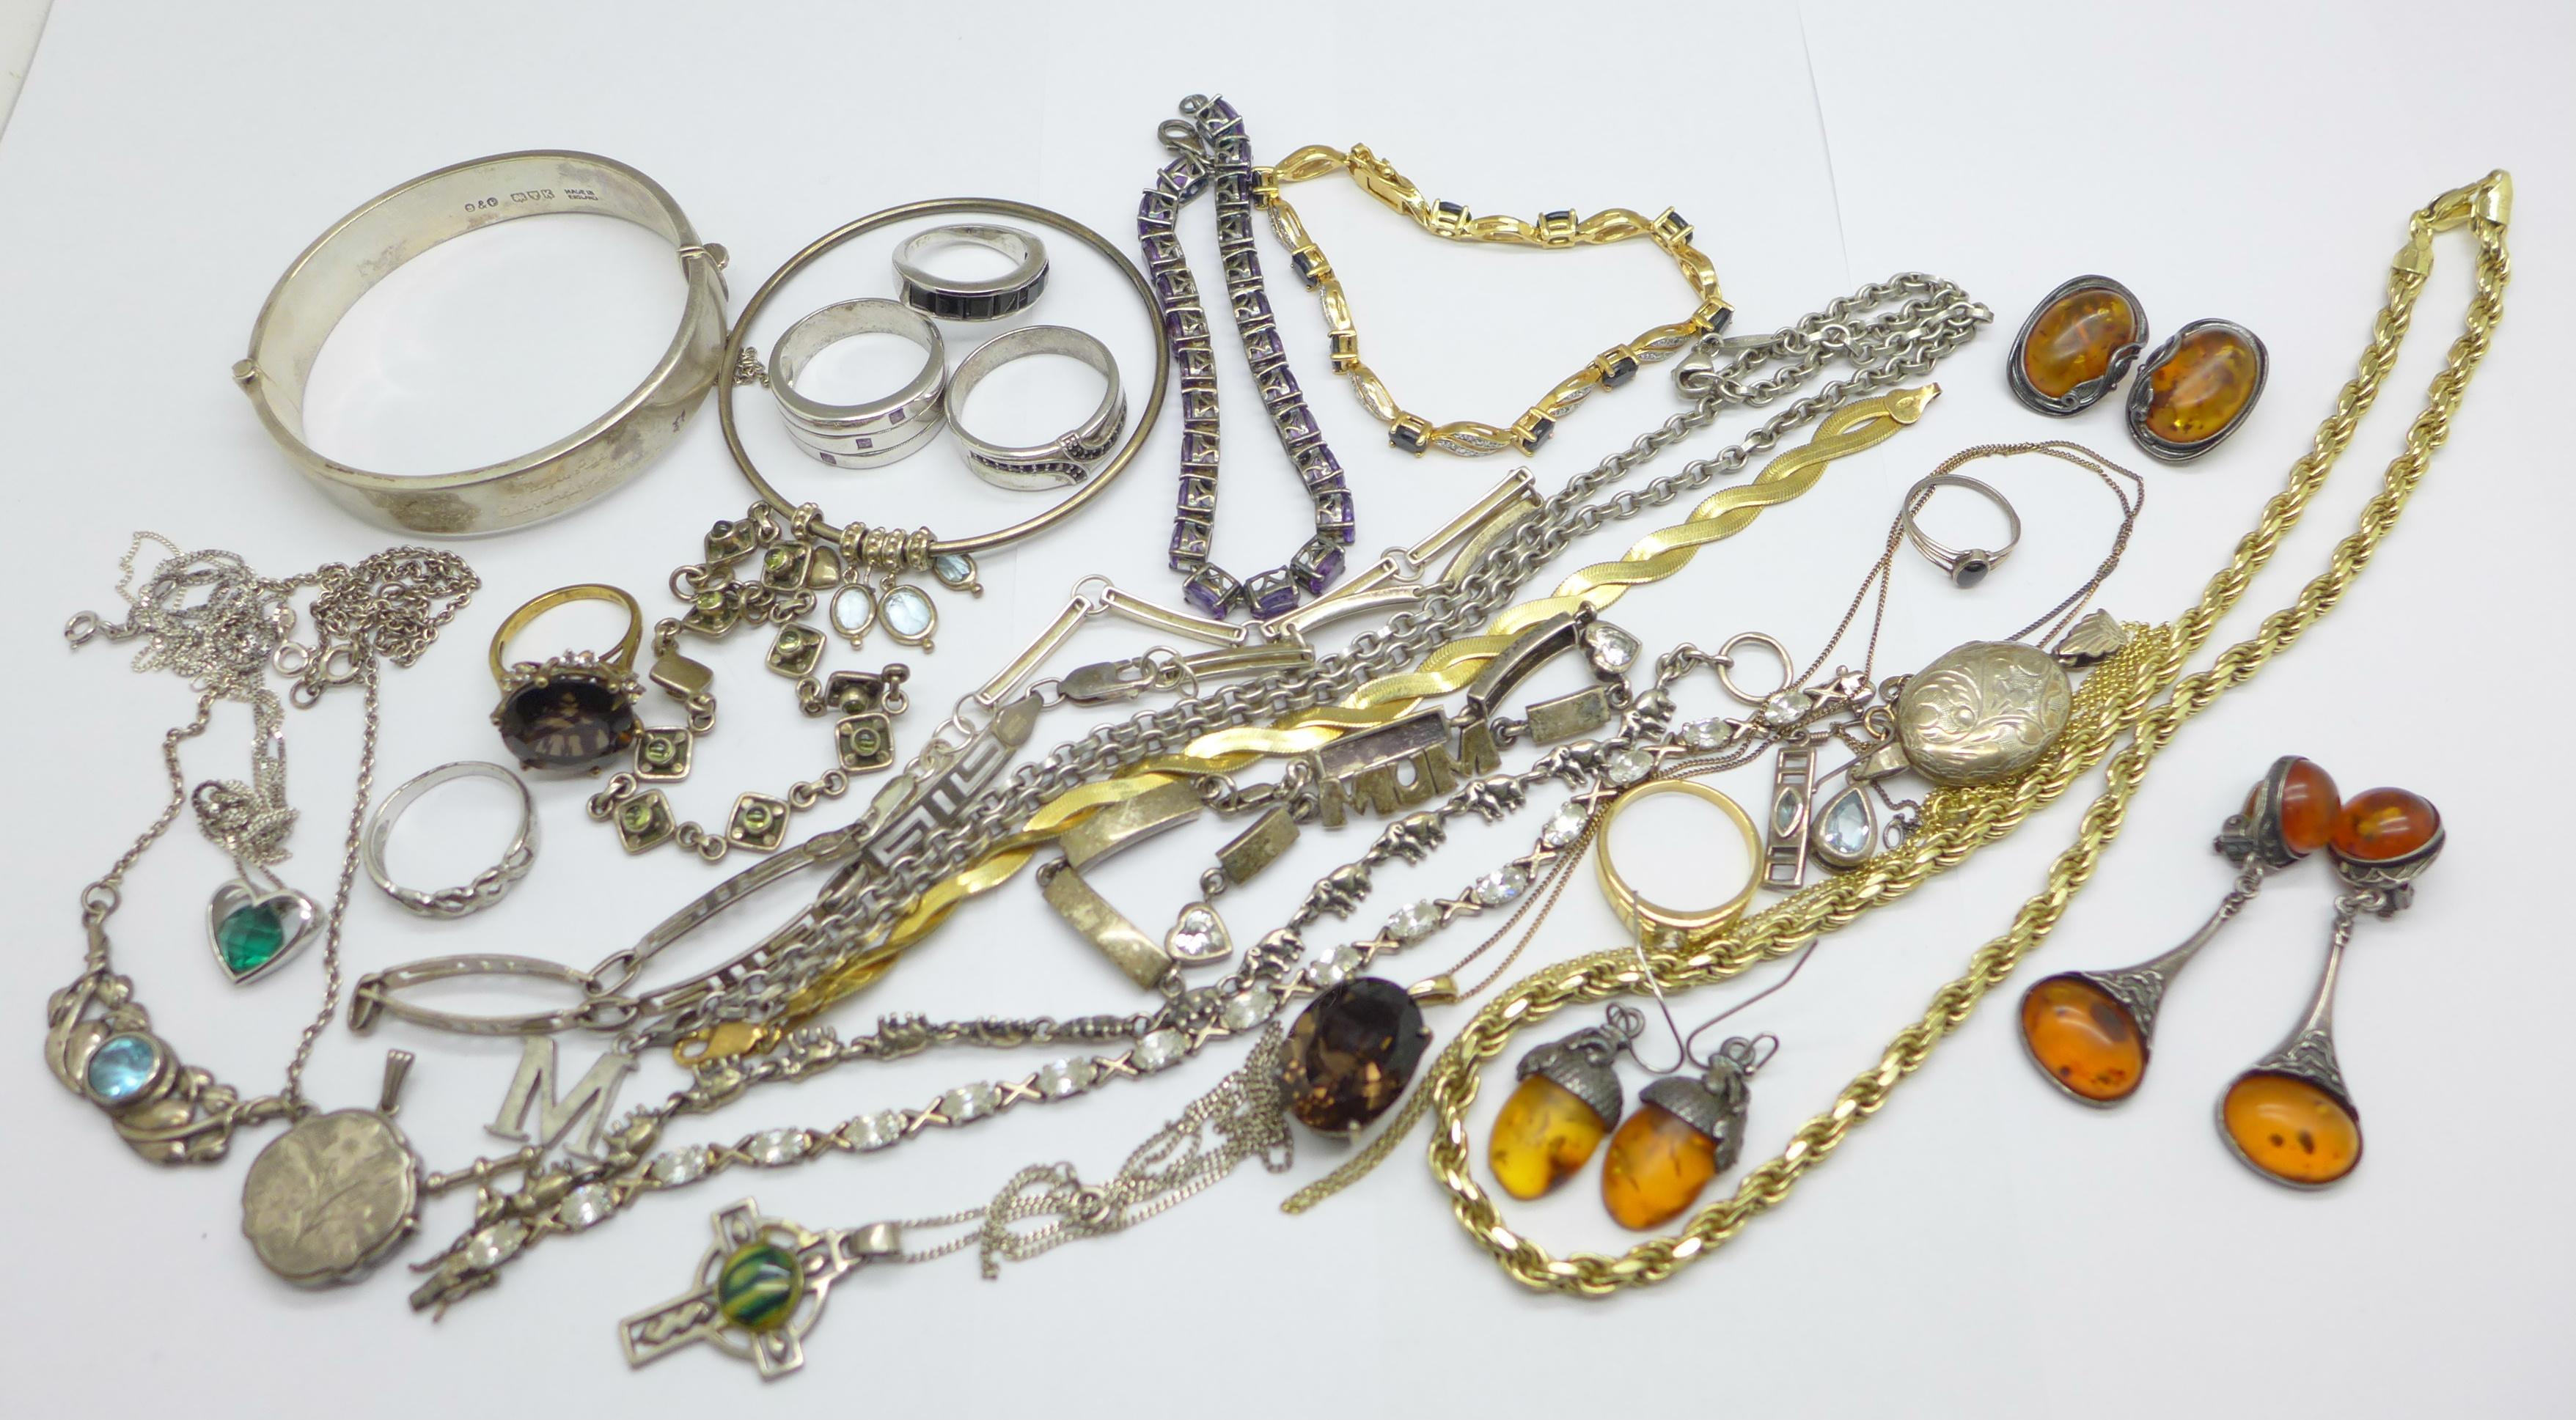 Silver jewellery including a hallmarked bangle, an elephant bracelet and a Thomas Sabo neck chain,